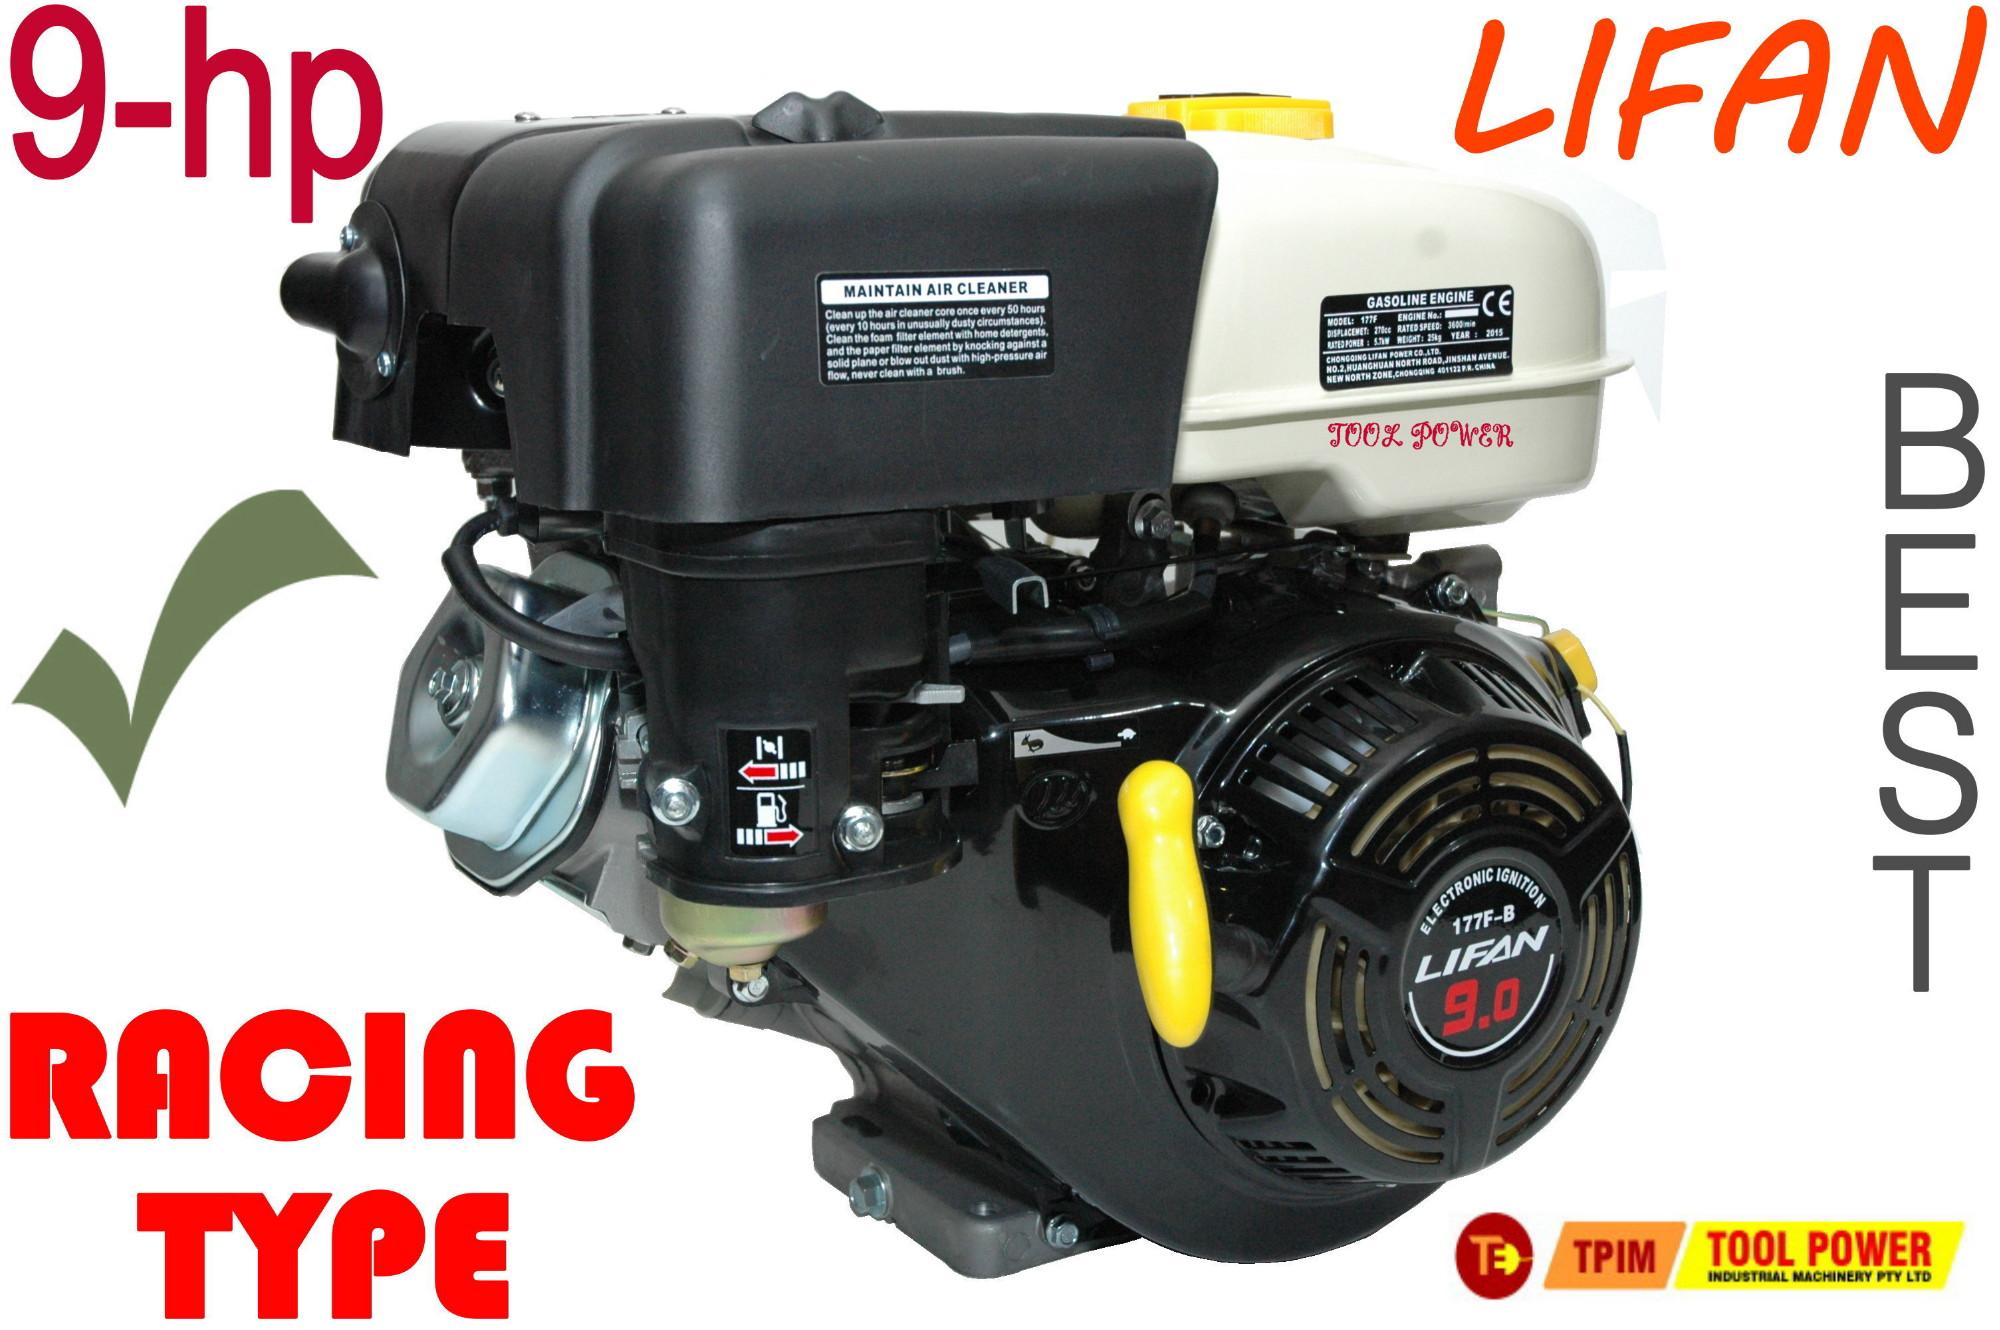 Engine 9 hp Lifan for pumps, Generators, Log Splitters